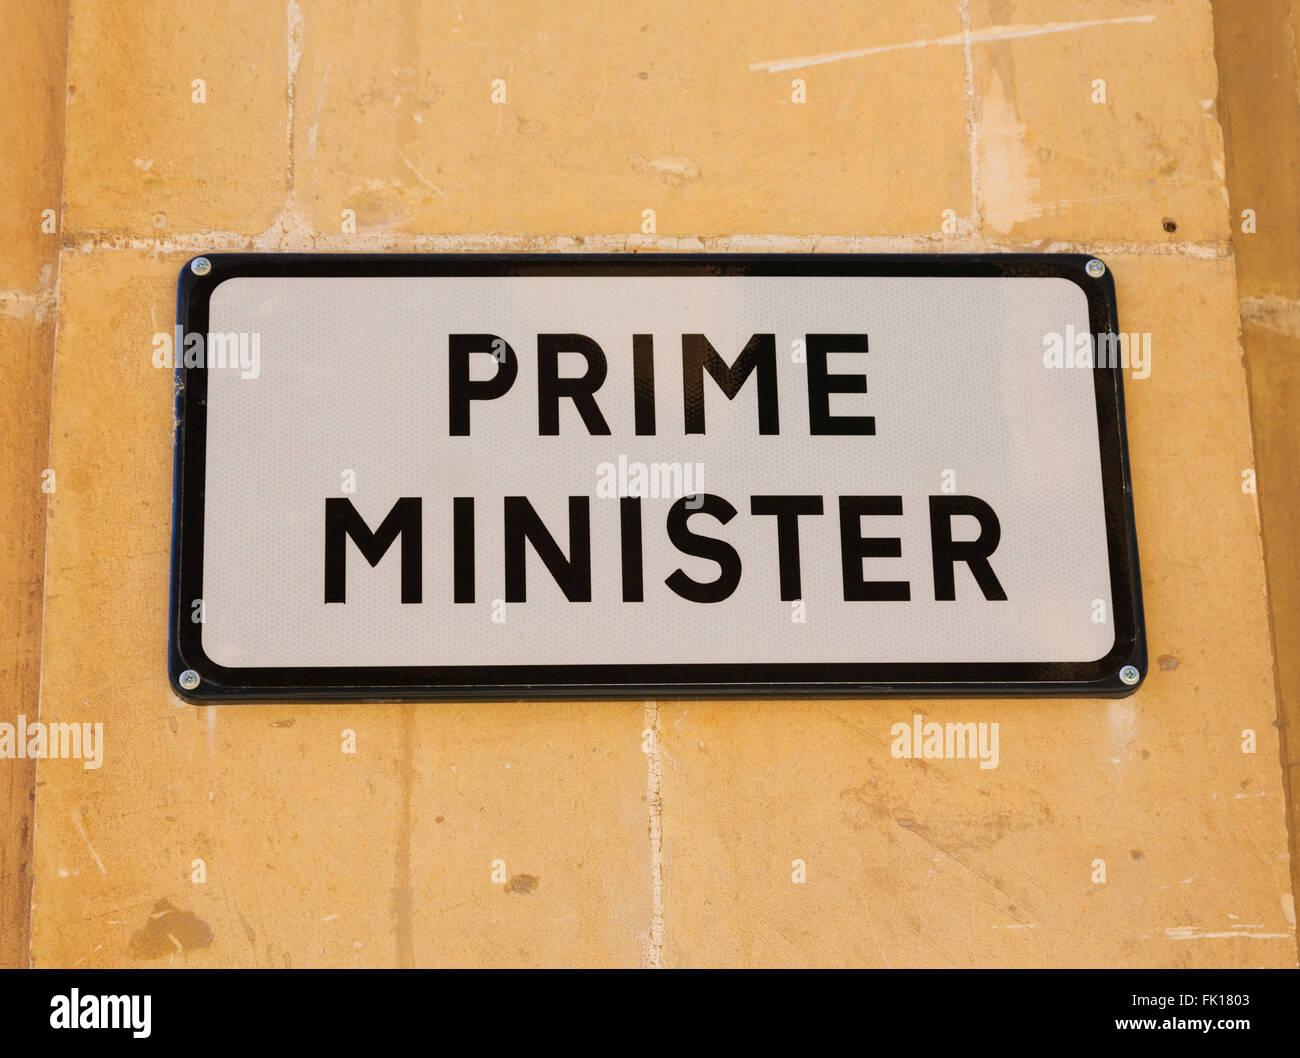 malta parliament stockfotos malta parliament bilder alamy. Black Bedroom Furniture Sets. Home Design Ideas